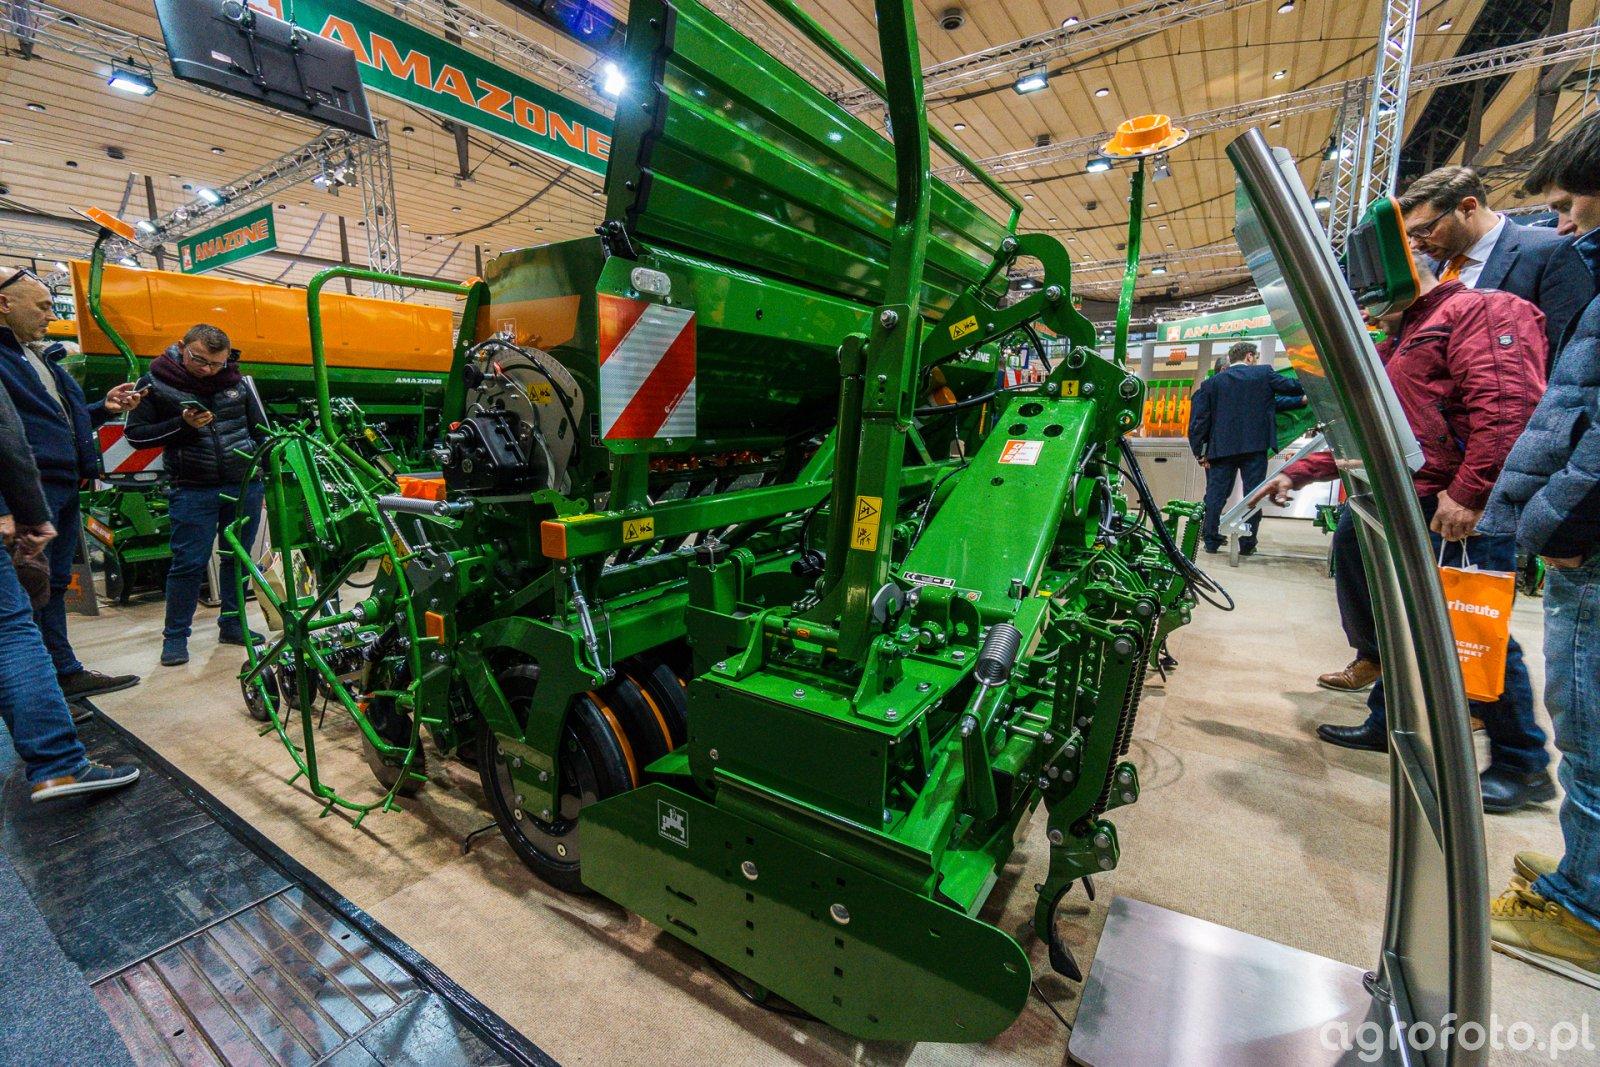 Agritechnica 2017